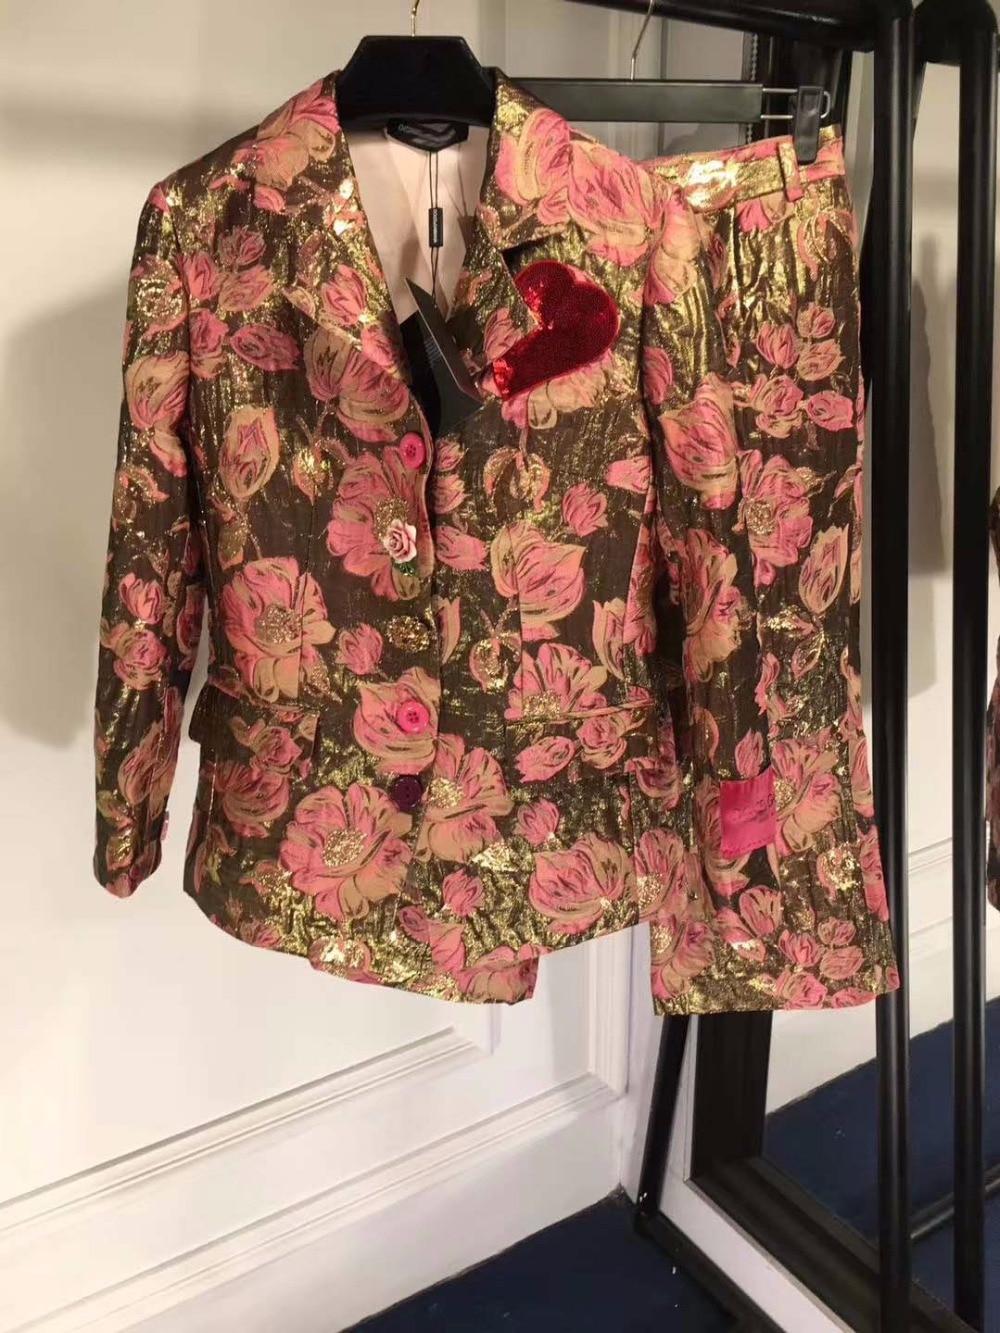 Trouser-Suit Ladies Suits Embroidery 2piece-Set Gold Metallic Line No for Women Noble